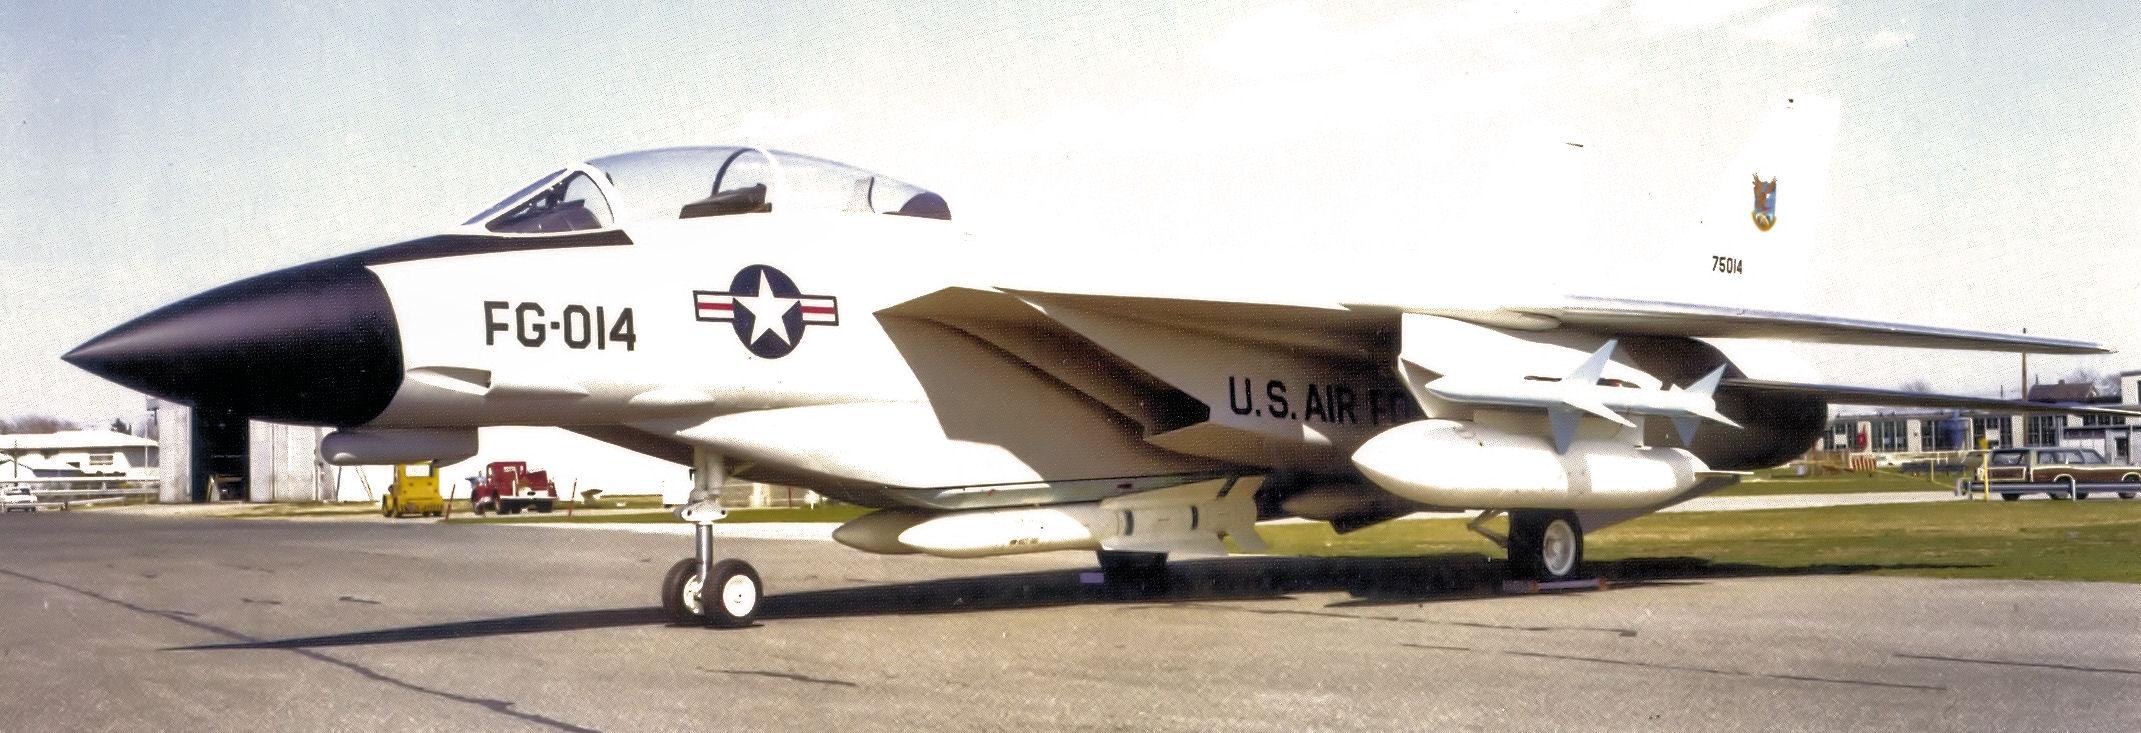 USAF_ADCOM_Grumman_F-14_Tomcat_proposed_interceptor_-_1972.jpg